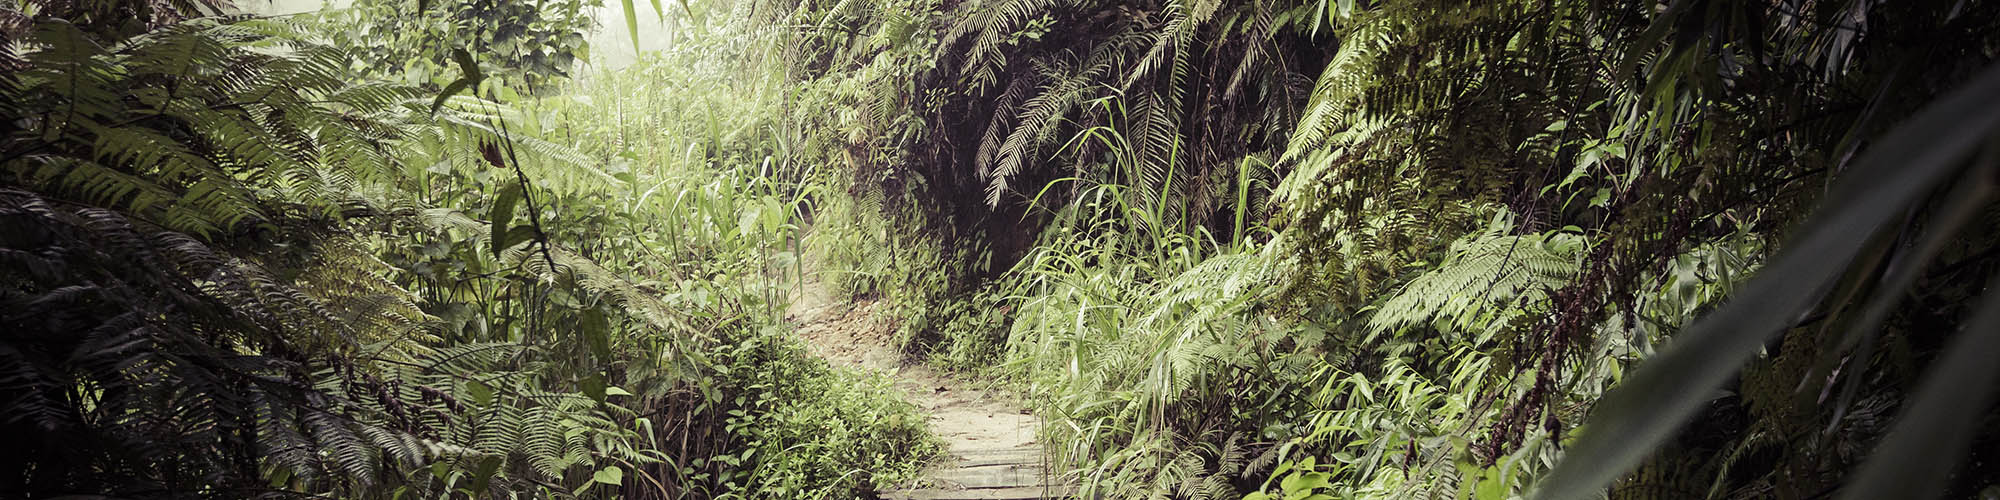 Tropical forest, Sinharaja, Sri Lanka